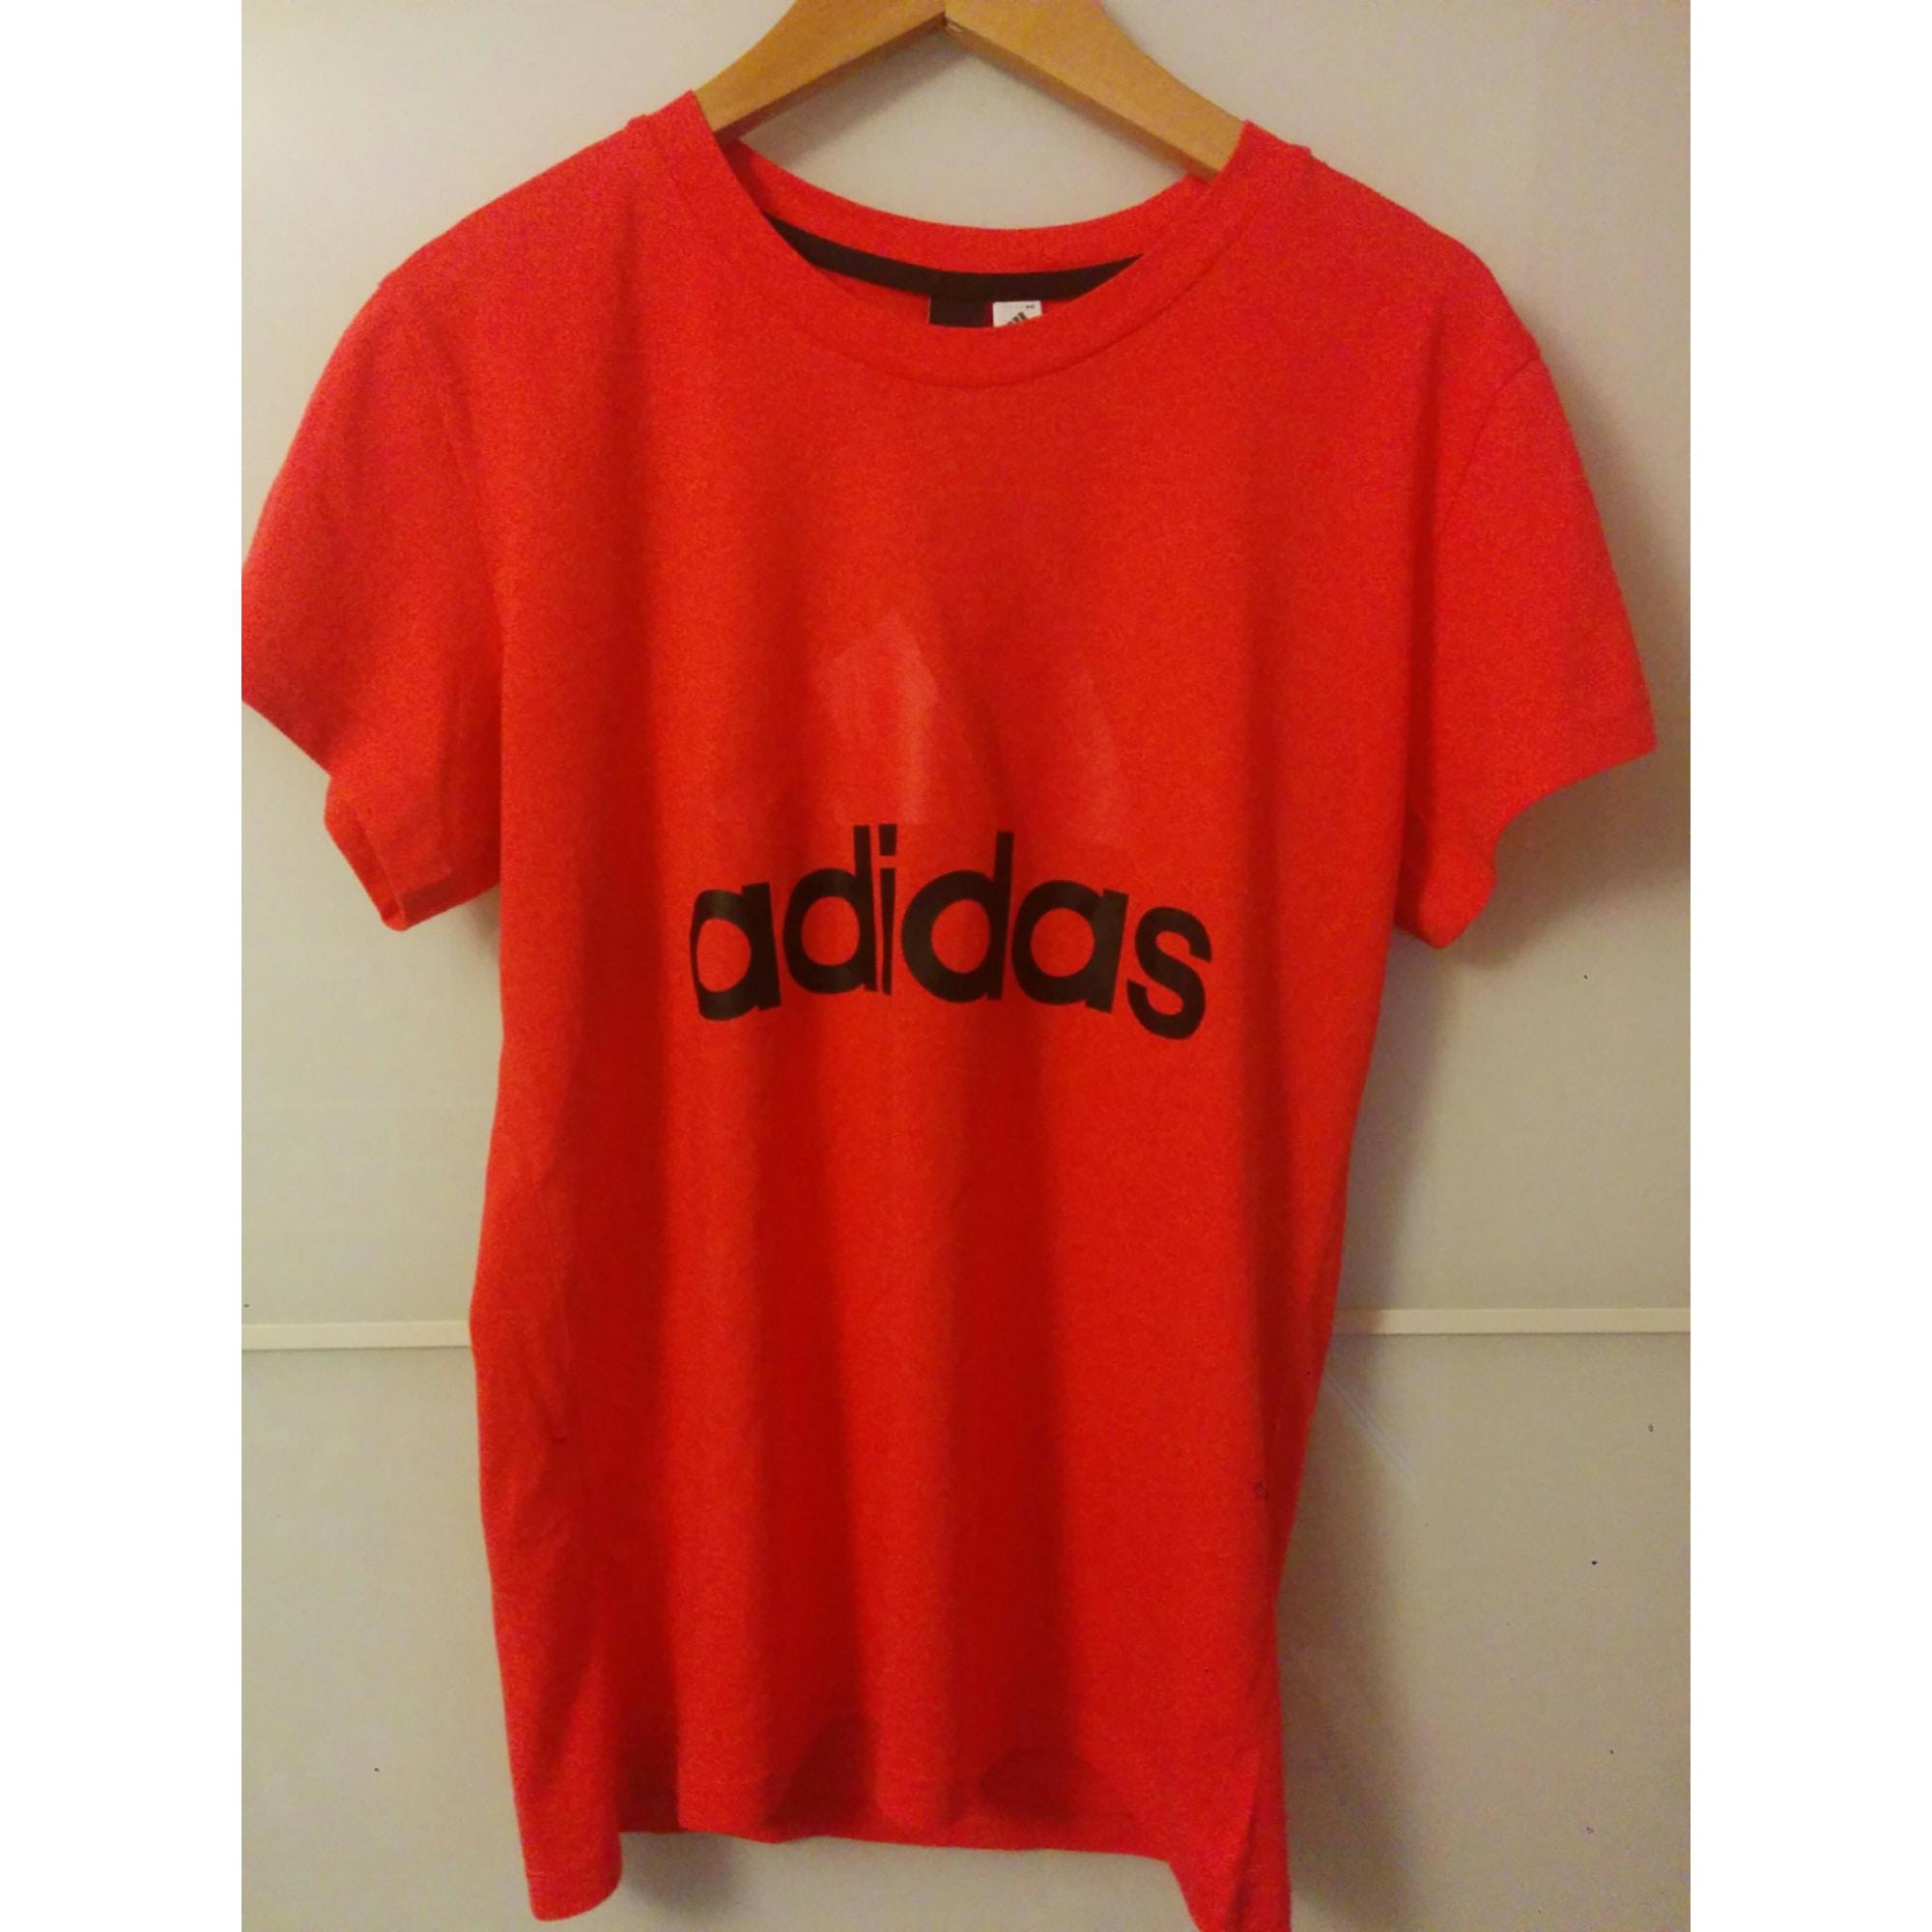 7052838 T2 Shirt Top 38 Rose m Adidas Tee S0qw5qXf